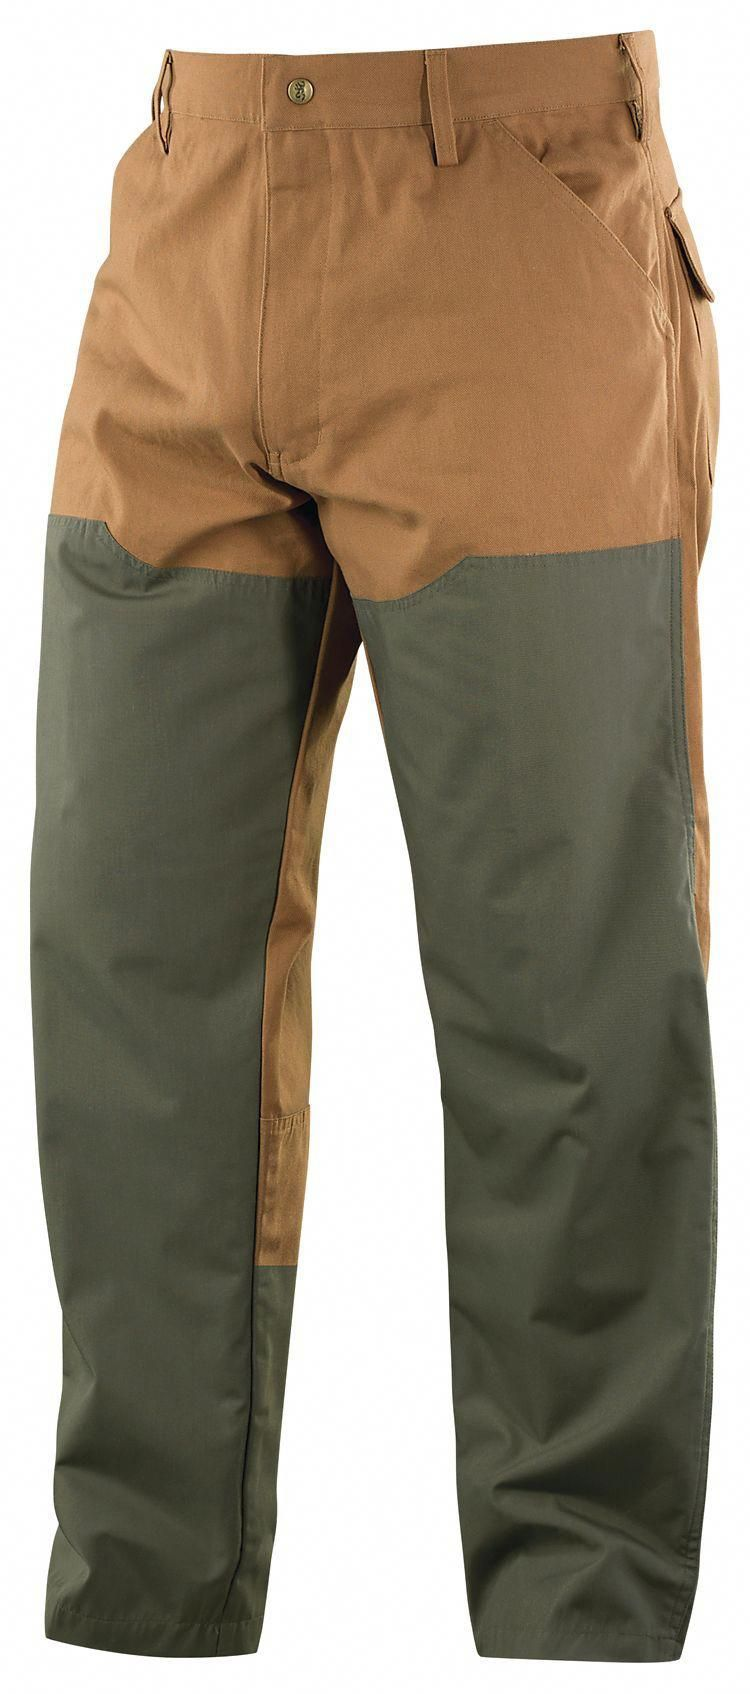 Browning Upland Canvas Pant for Men | Bass Pro Shops  #HuntingApparelandClothesforMen